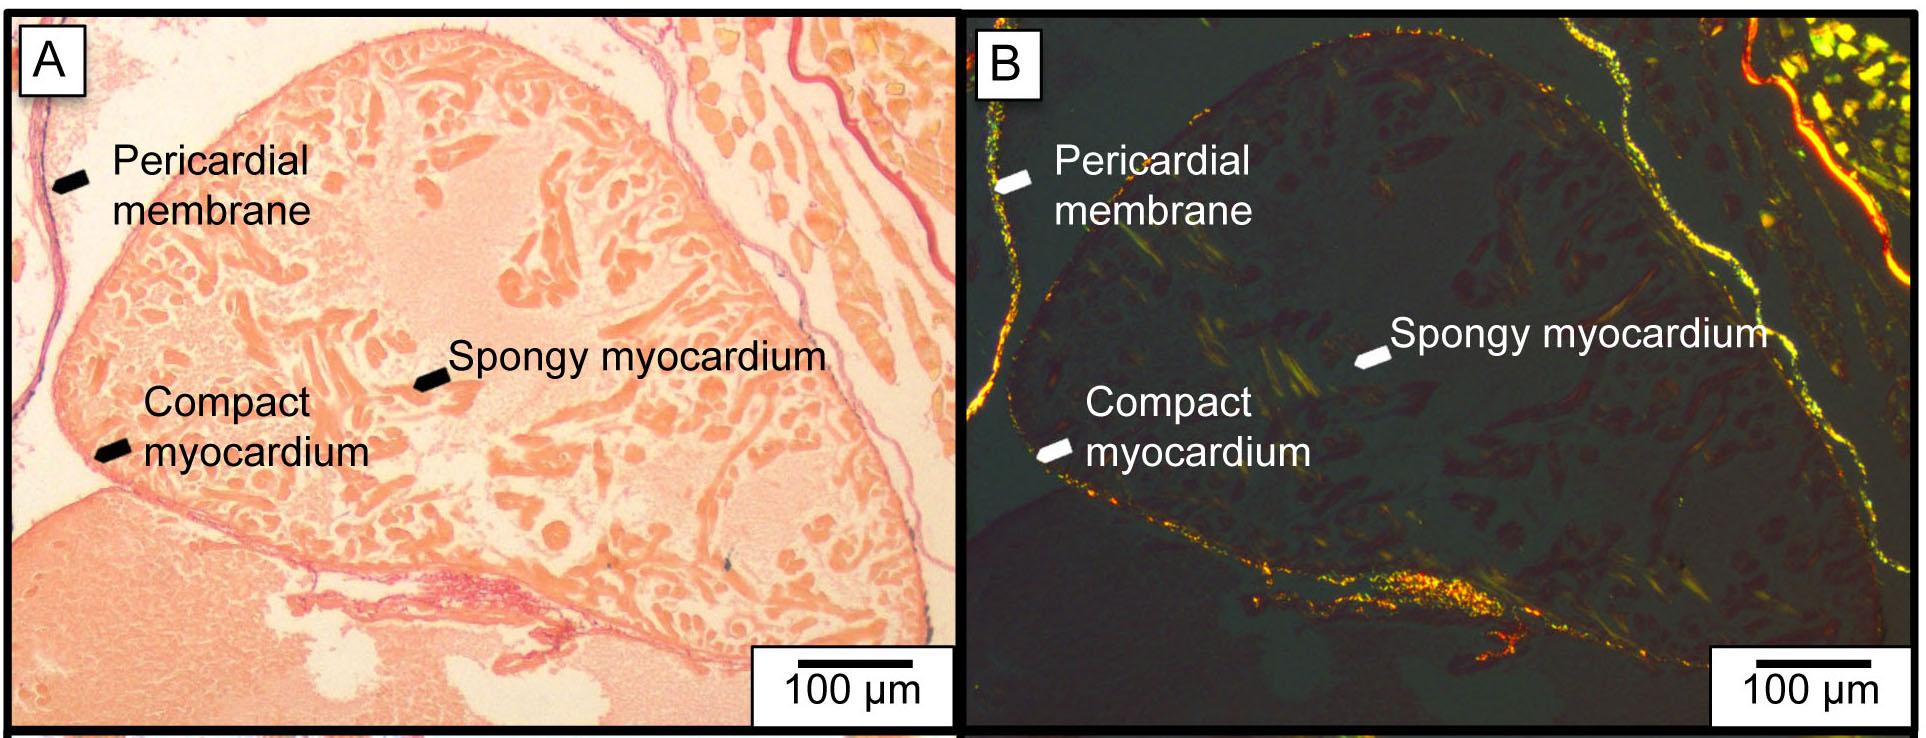 Connective tissue in zebrafish heart